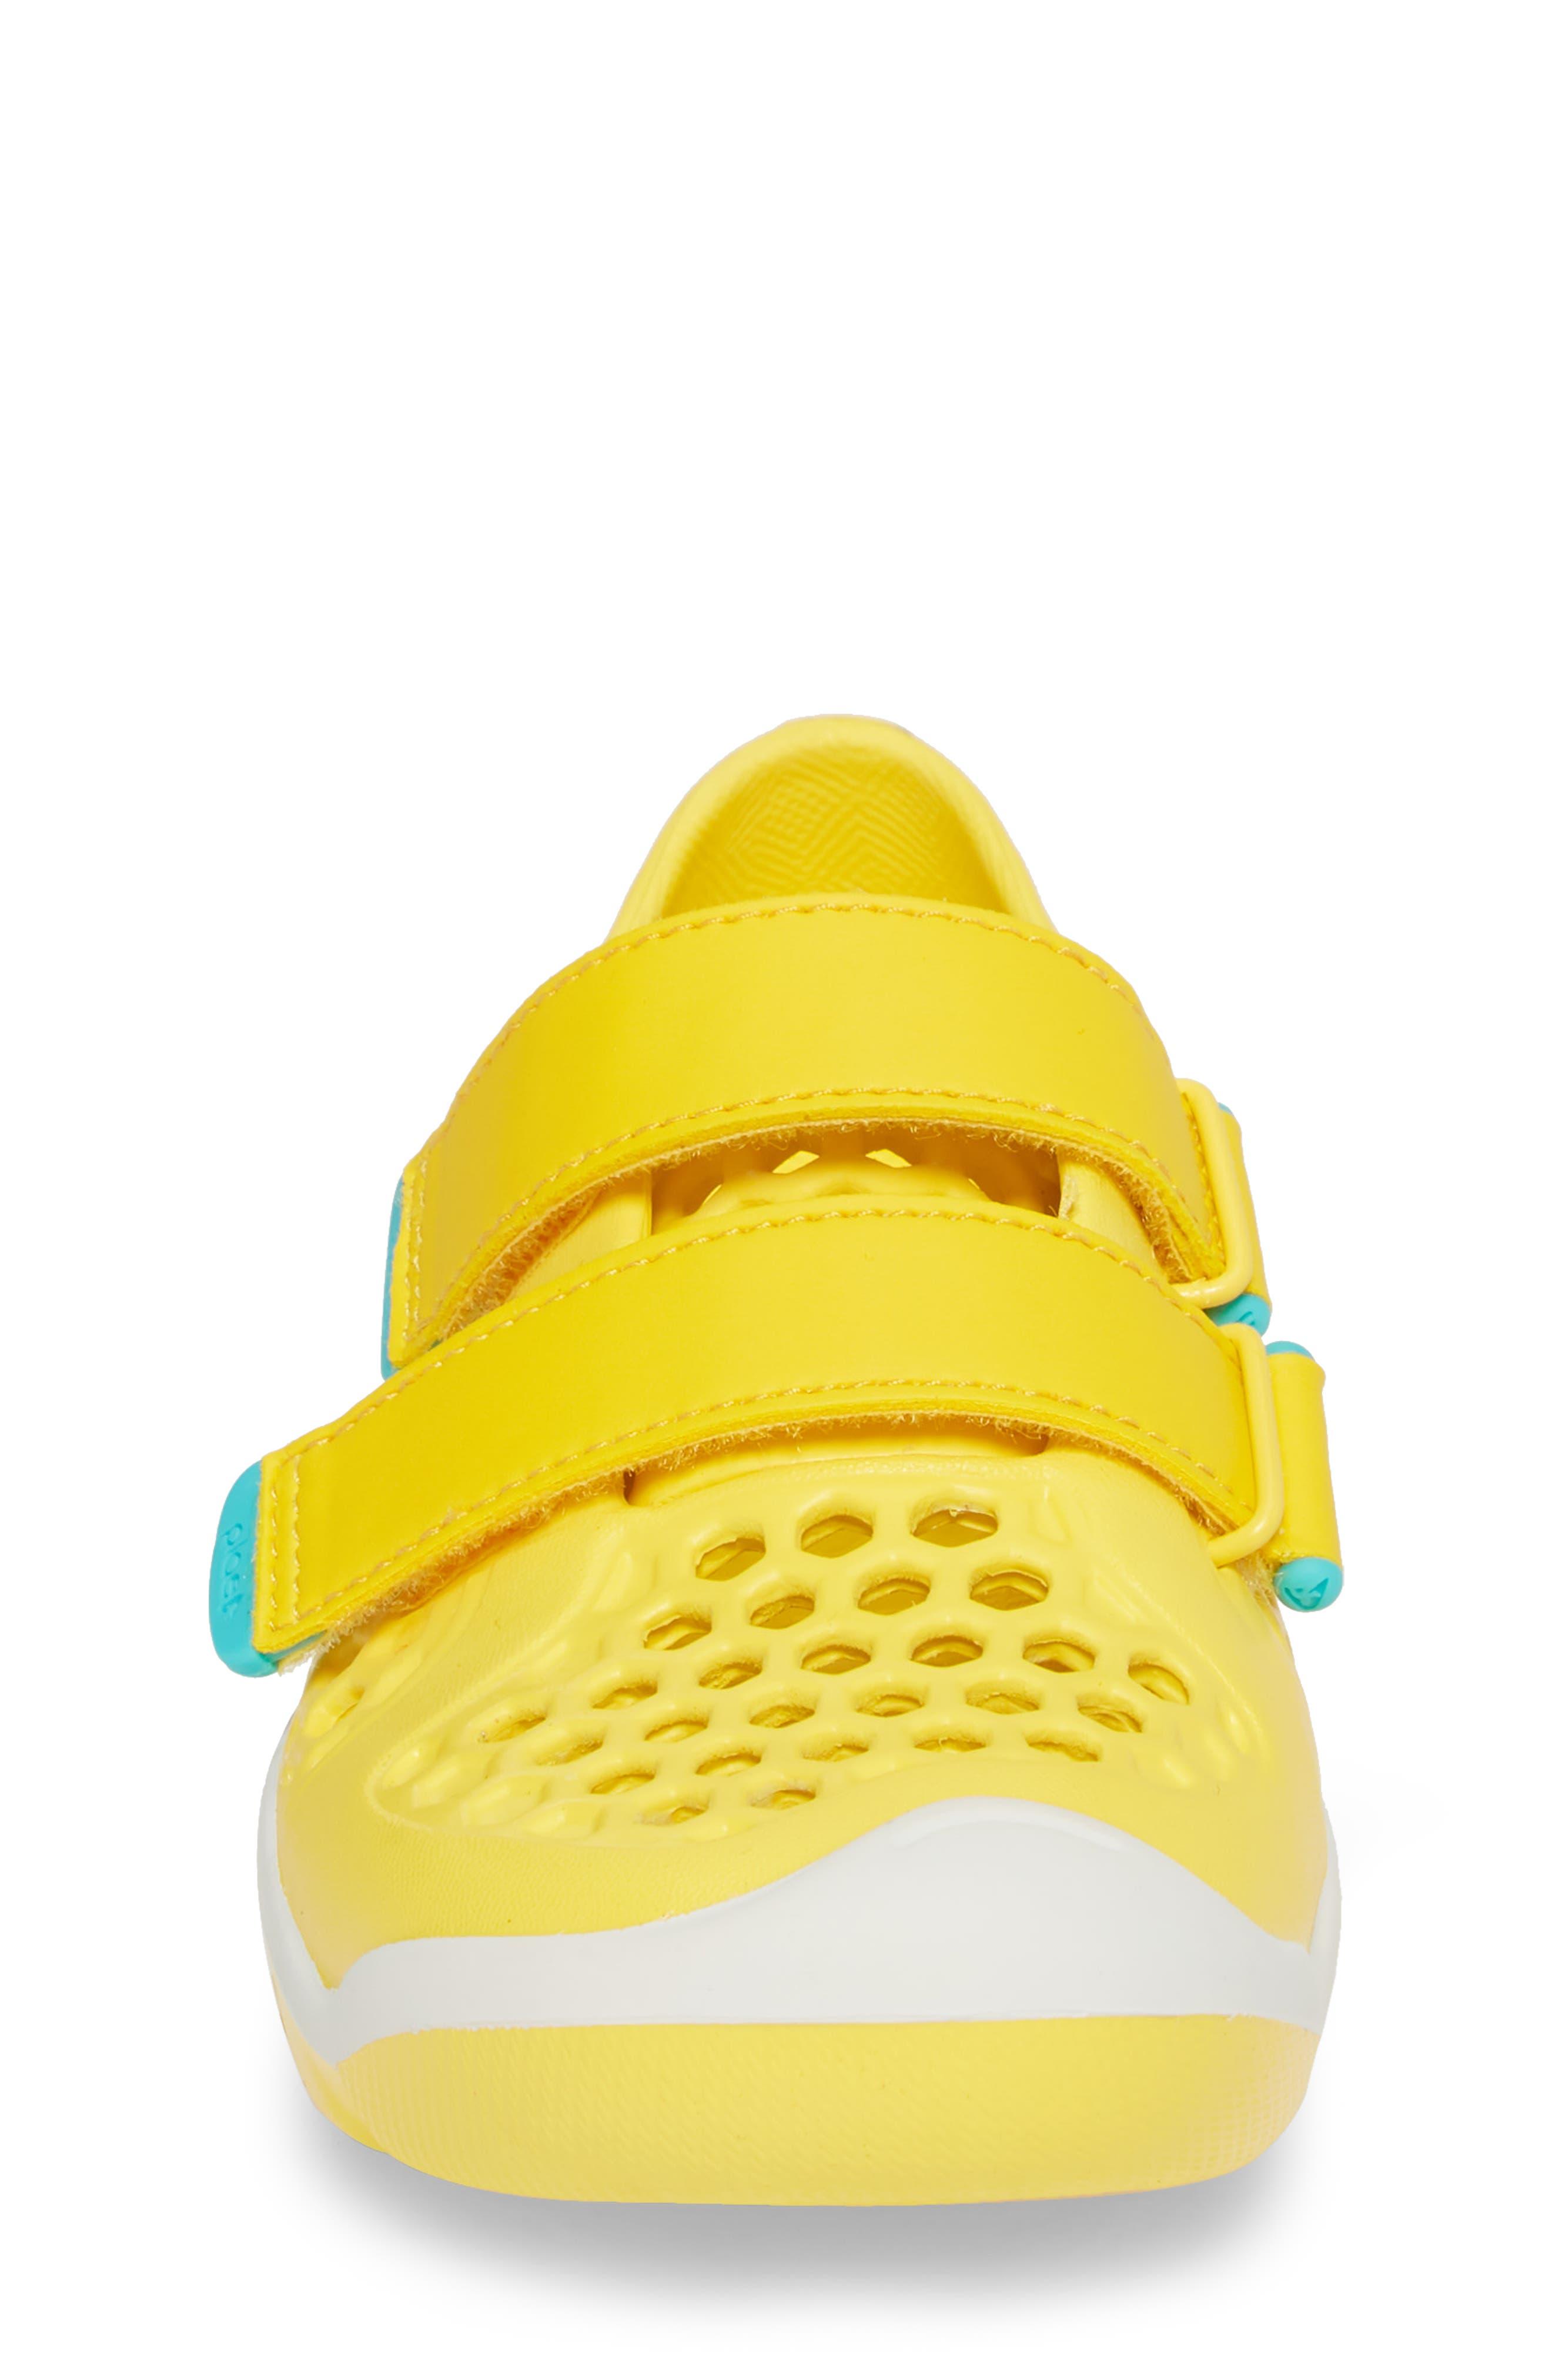 Mimo Customizable Sneaker,                             Alternate thumbnail 4, color,                             Dandelion